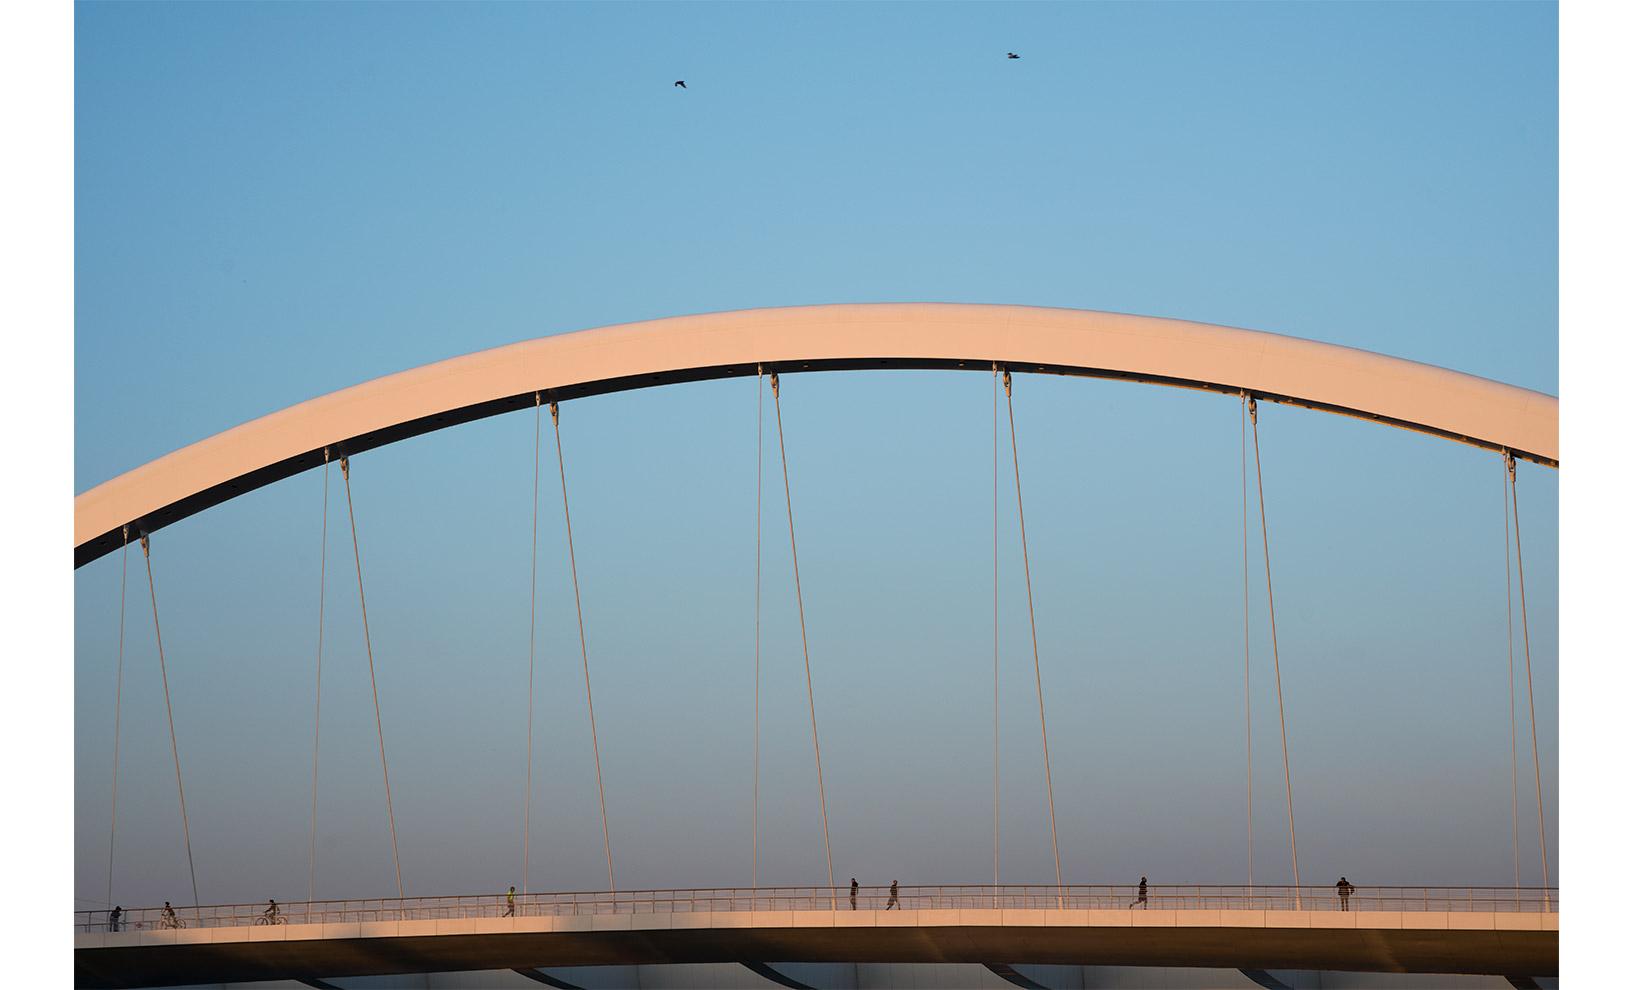 ©marco-tacchini-fotografo-ponte-cittadella-richar-meier-and-partners_20